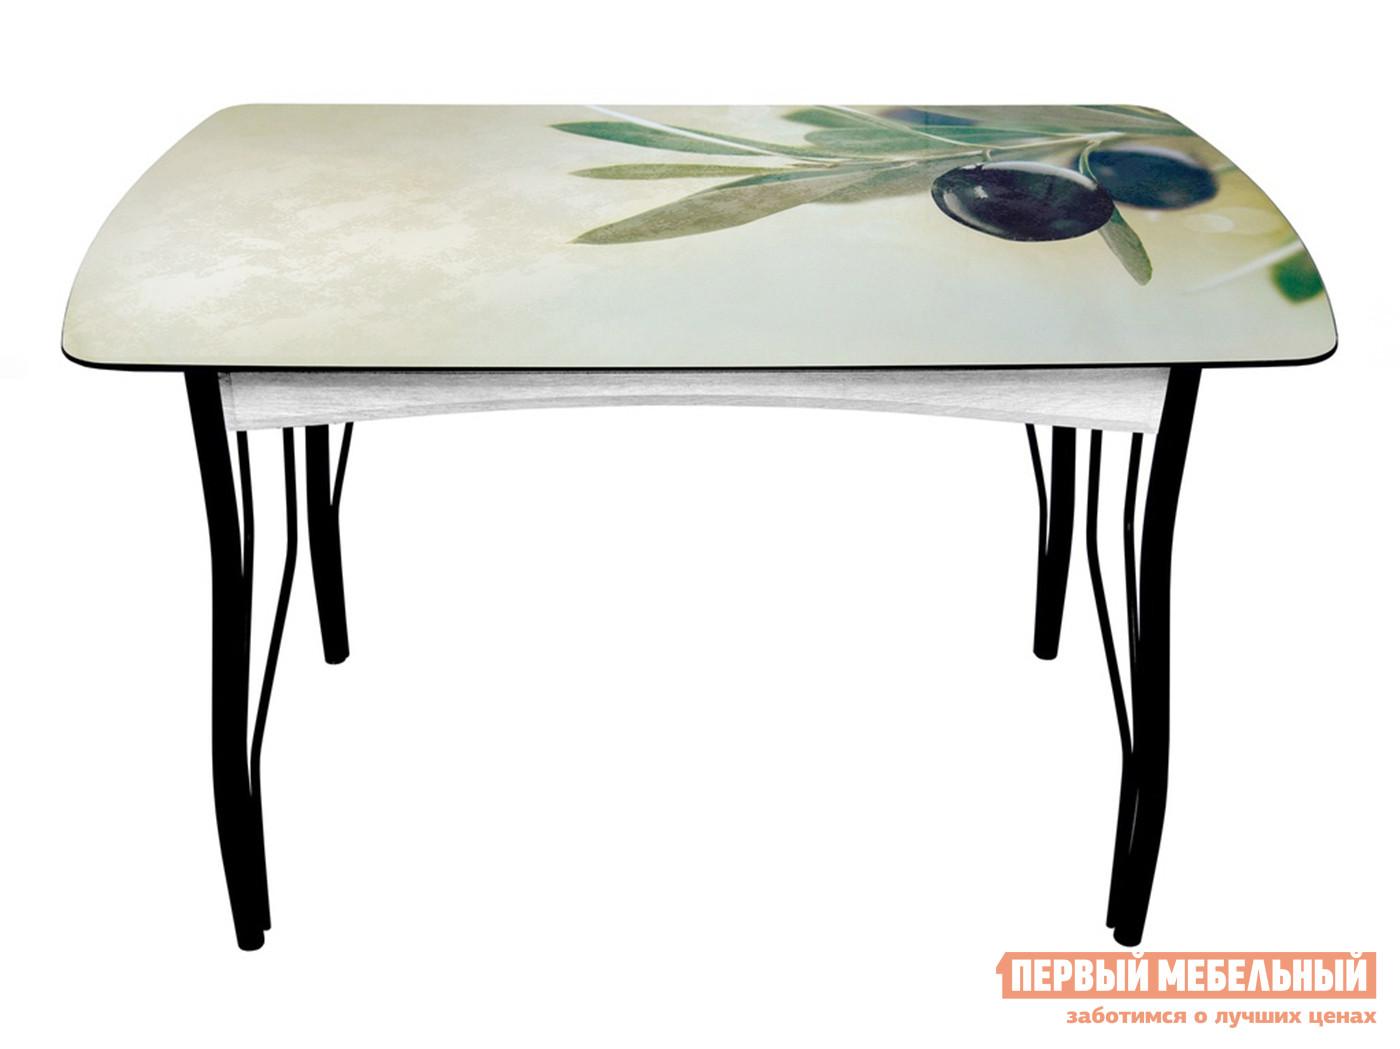 Кухонный стол  Стол обеденный Фиеста Олива — Стол обеденный Фиеста Олива